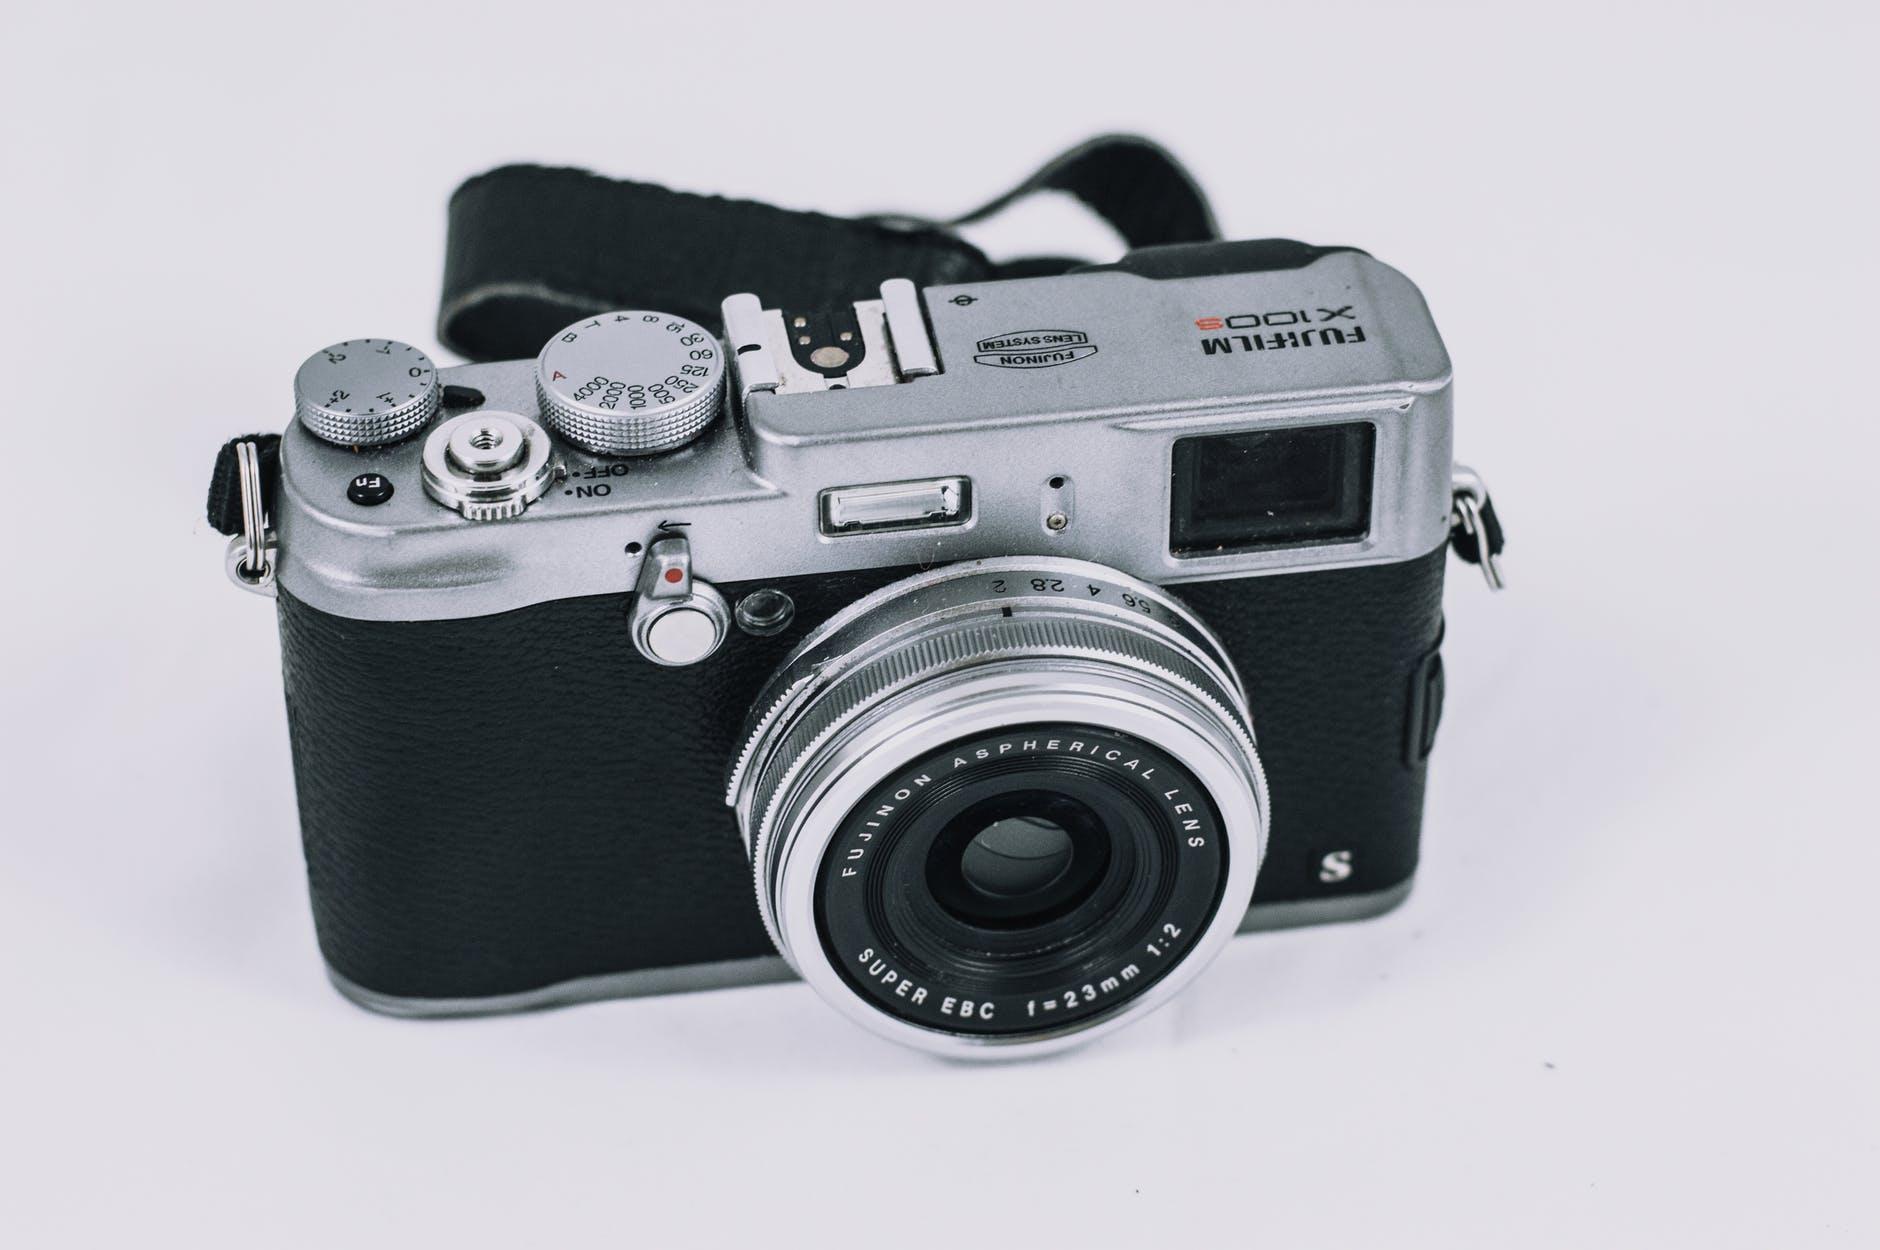 black and gray fujifilm camera